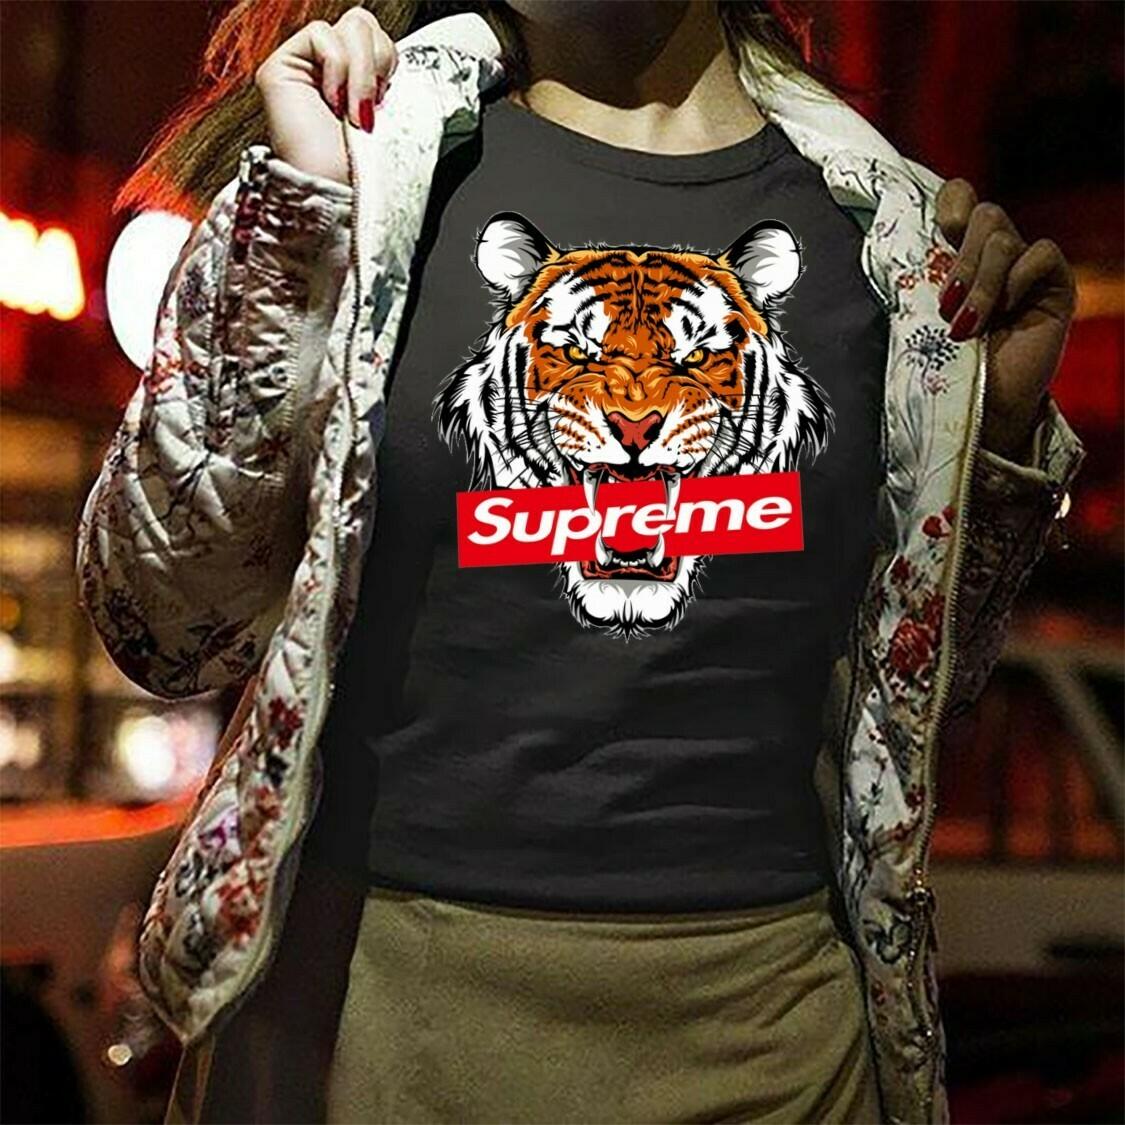 Tiger Supreme,Logo Gucci,Gucci Shirt,Gucci Tshirt,Gucci Logo,Gucci Fashion shirt,Fashion shirt,Gucci Design shirt,Snake Gucci vintage shirt Long Sleeve Sweatshirt Hoodie Jolly Family Gifts